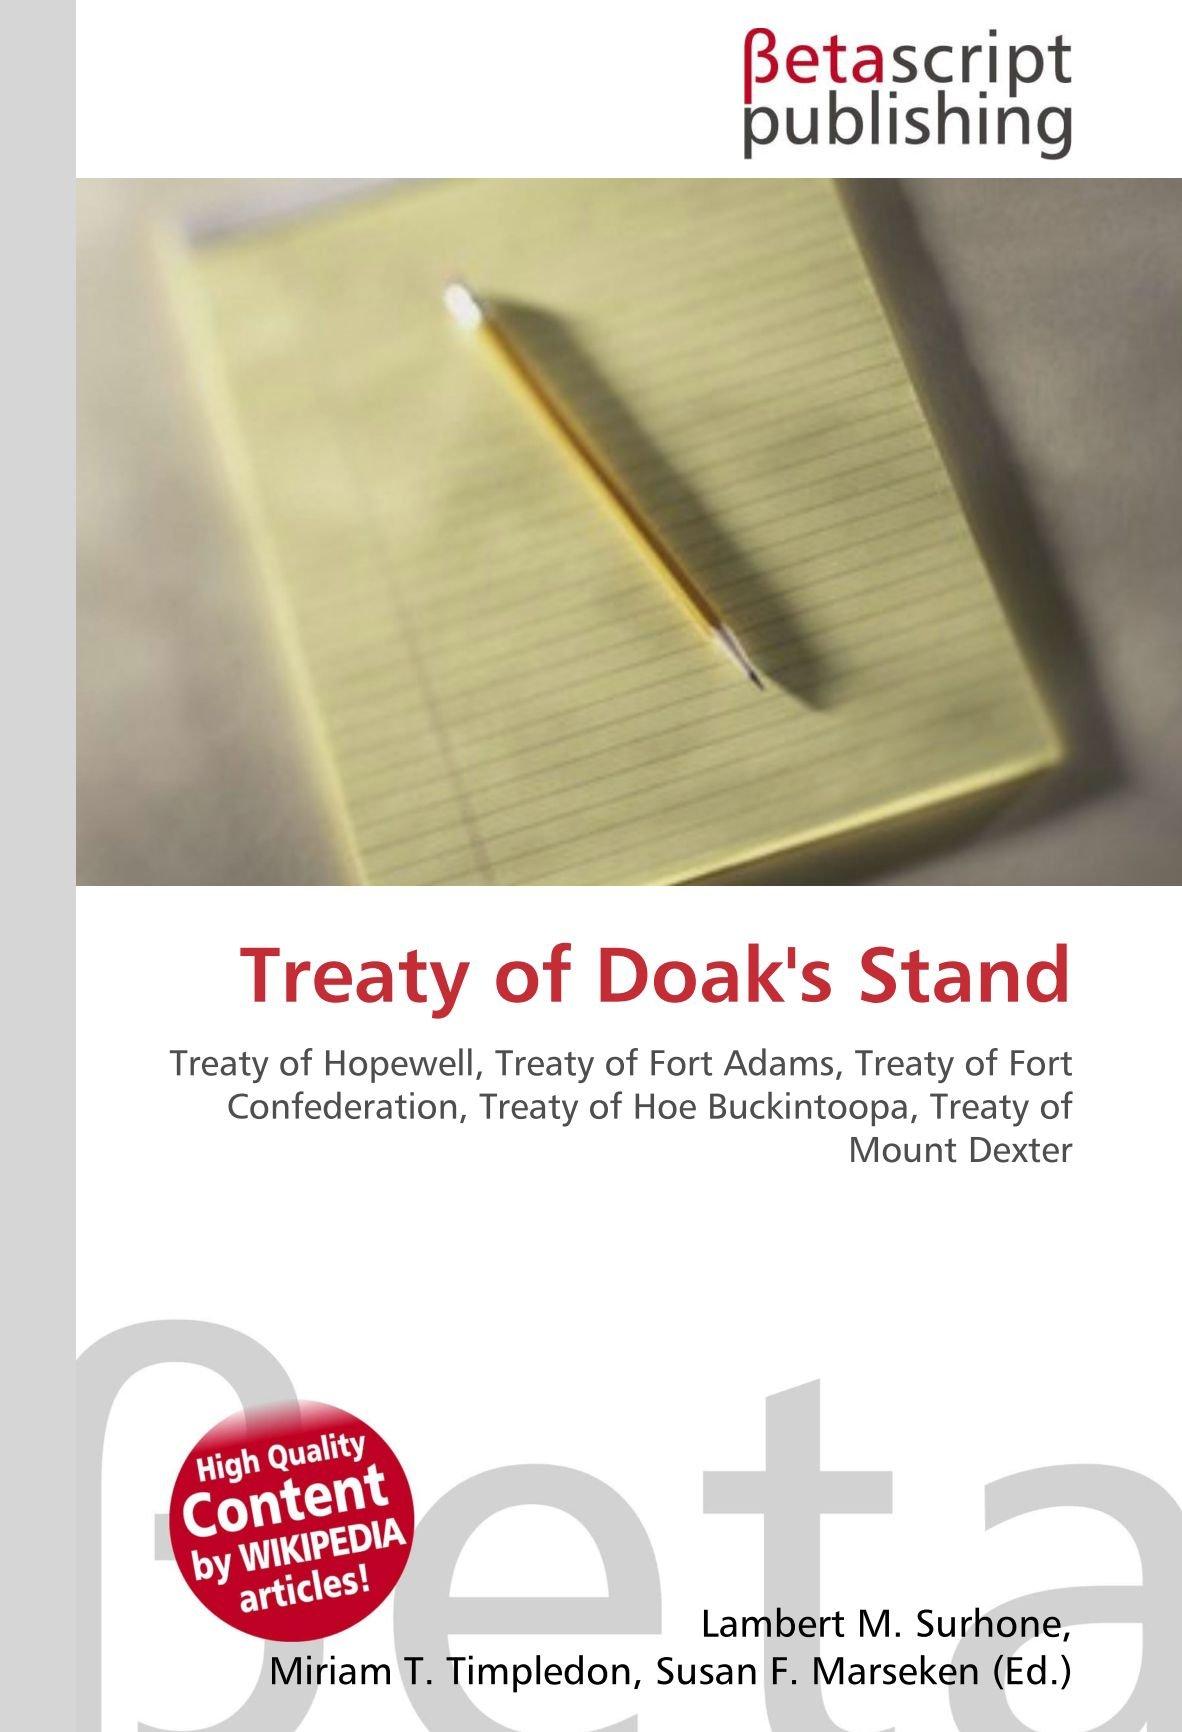 Treaty of Doaks Stand: Treaty of Hopewell, Treaty of Fort Adams, Treaty of Fort Confederation, Treaty of Hoe Buckintoopa, Treaty of Mount Dexter: Amazon.es: Surhone, Lambert M., Timpledon, Miriam T., Marseken, Susan